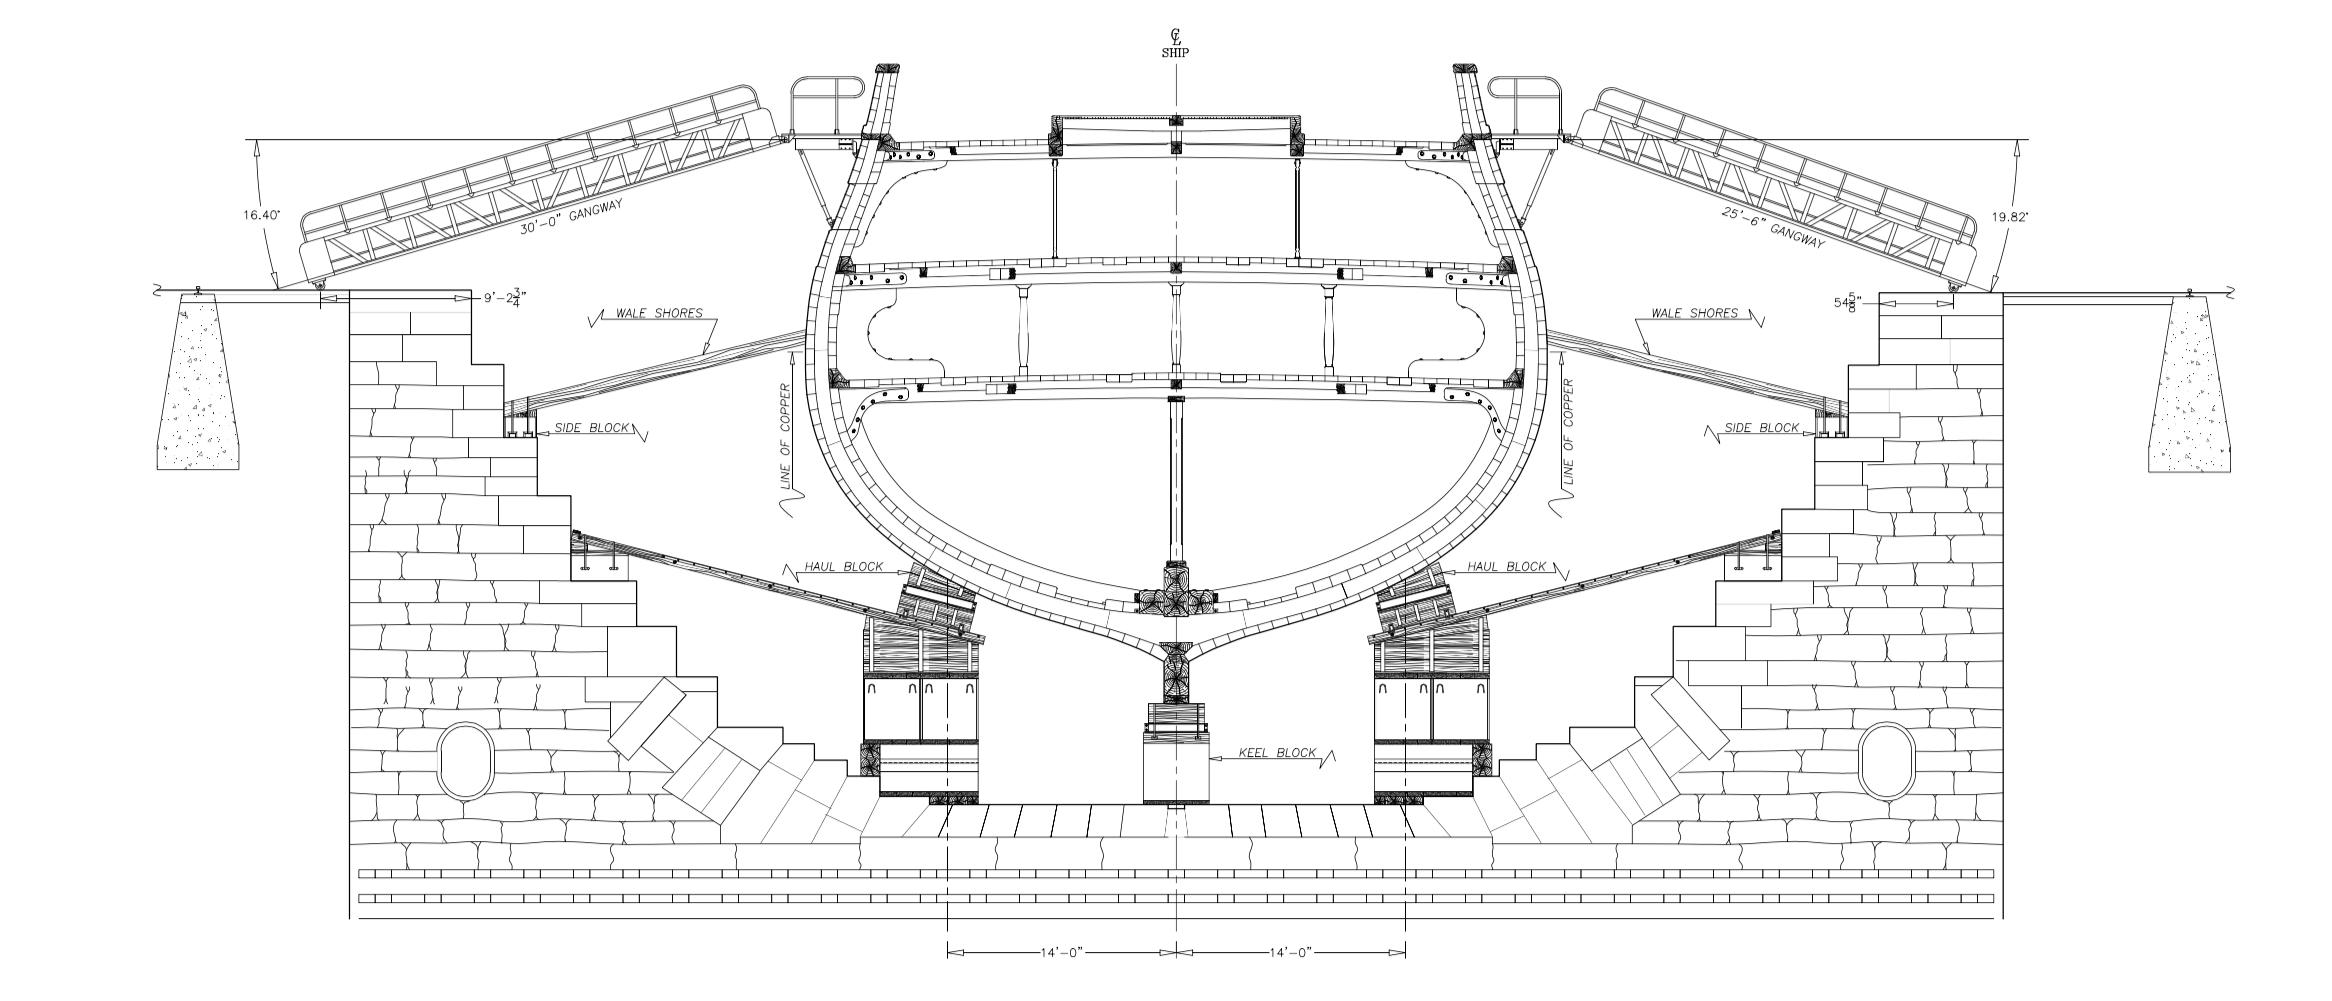 small resolution of dry dock diagram wiring diagram blog dry well diagram charlestown navy yard dock lines dry dock